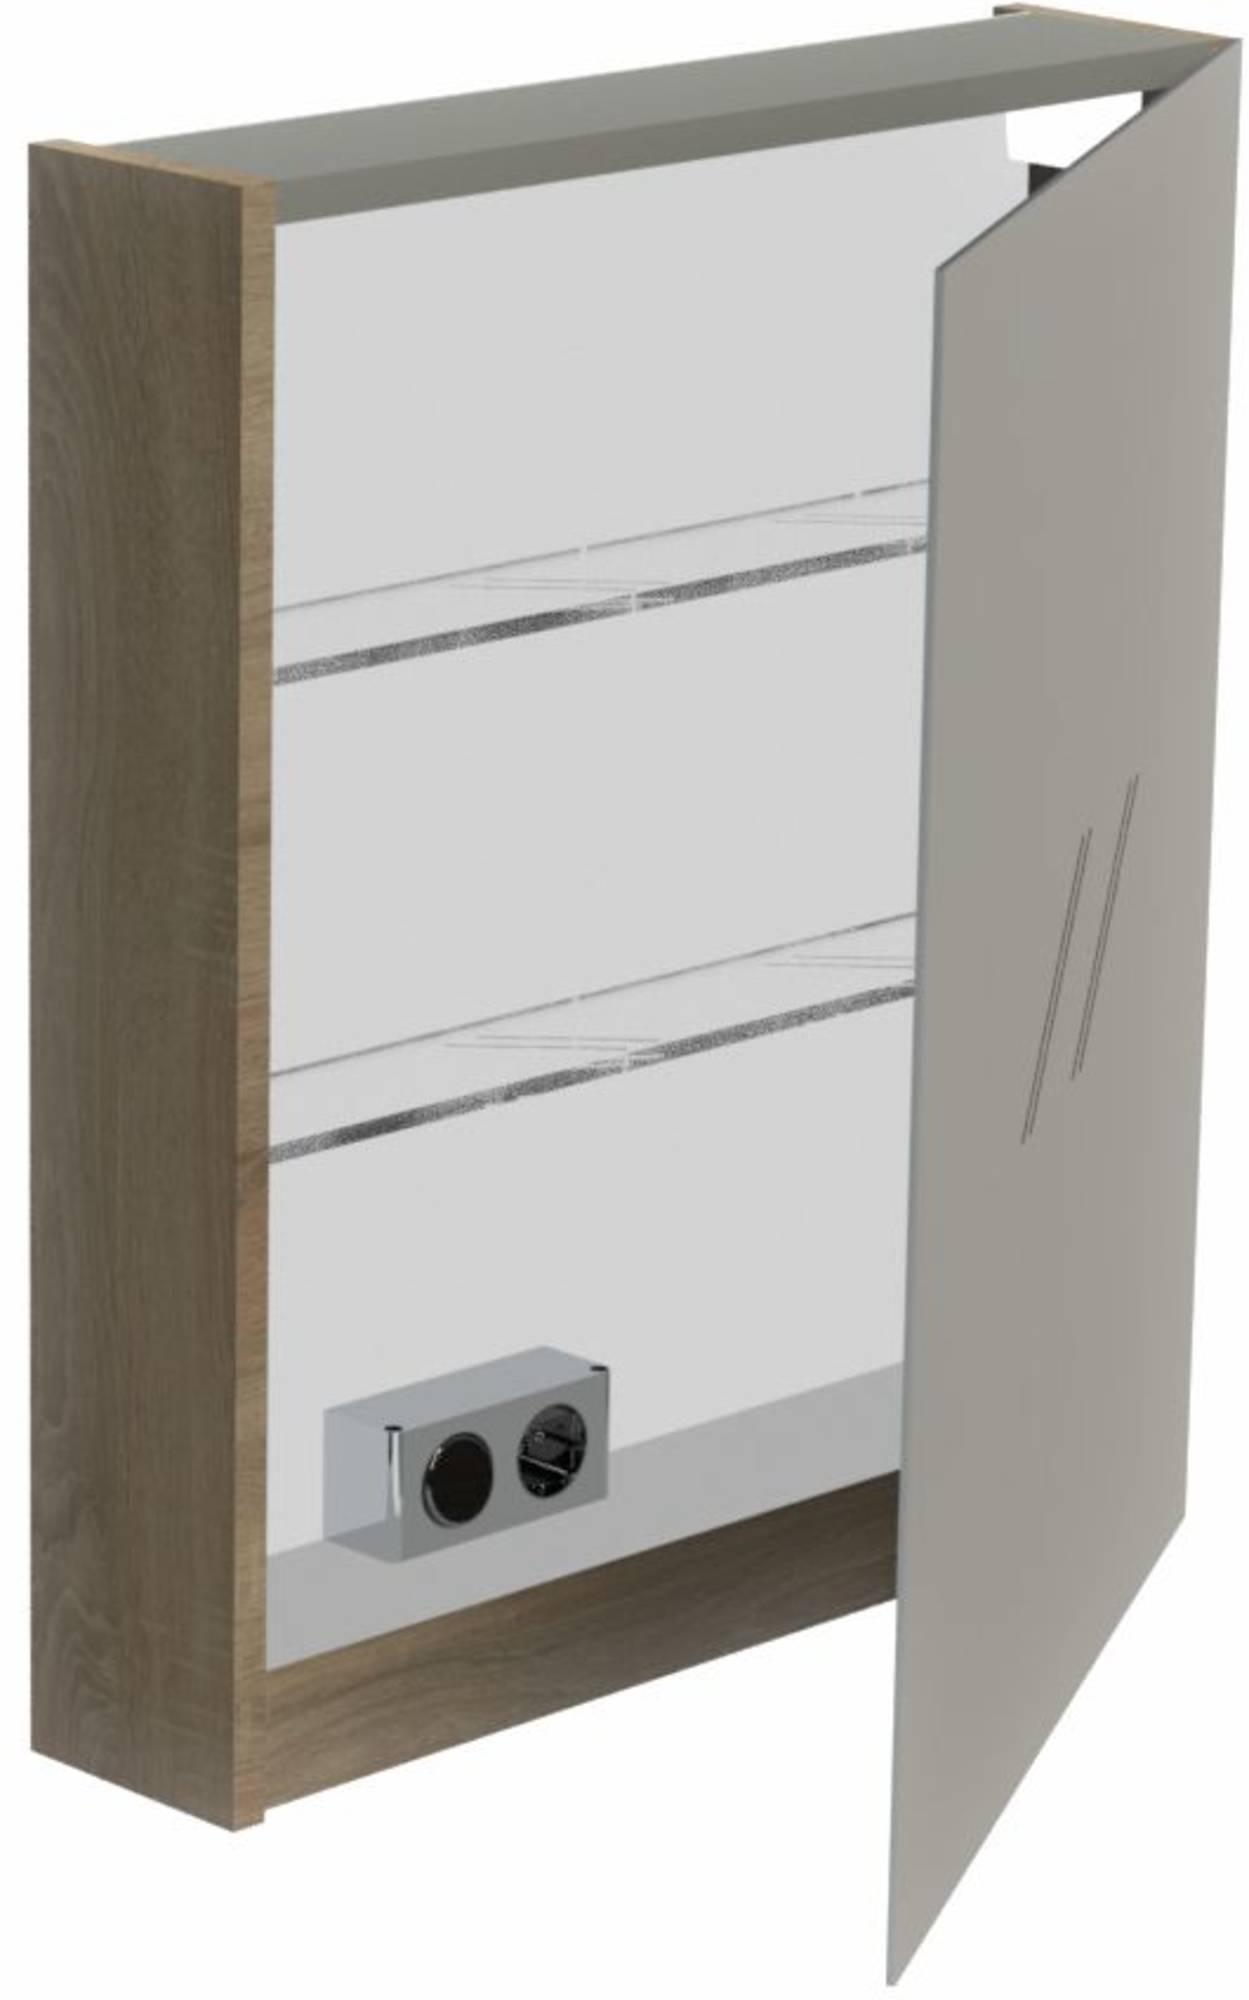 Thebalux Basic Spiegelkast linksdraaiend 70x60x13,5 cm Essen Grijs